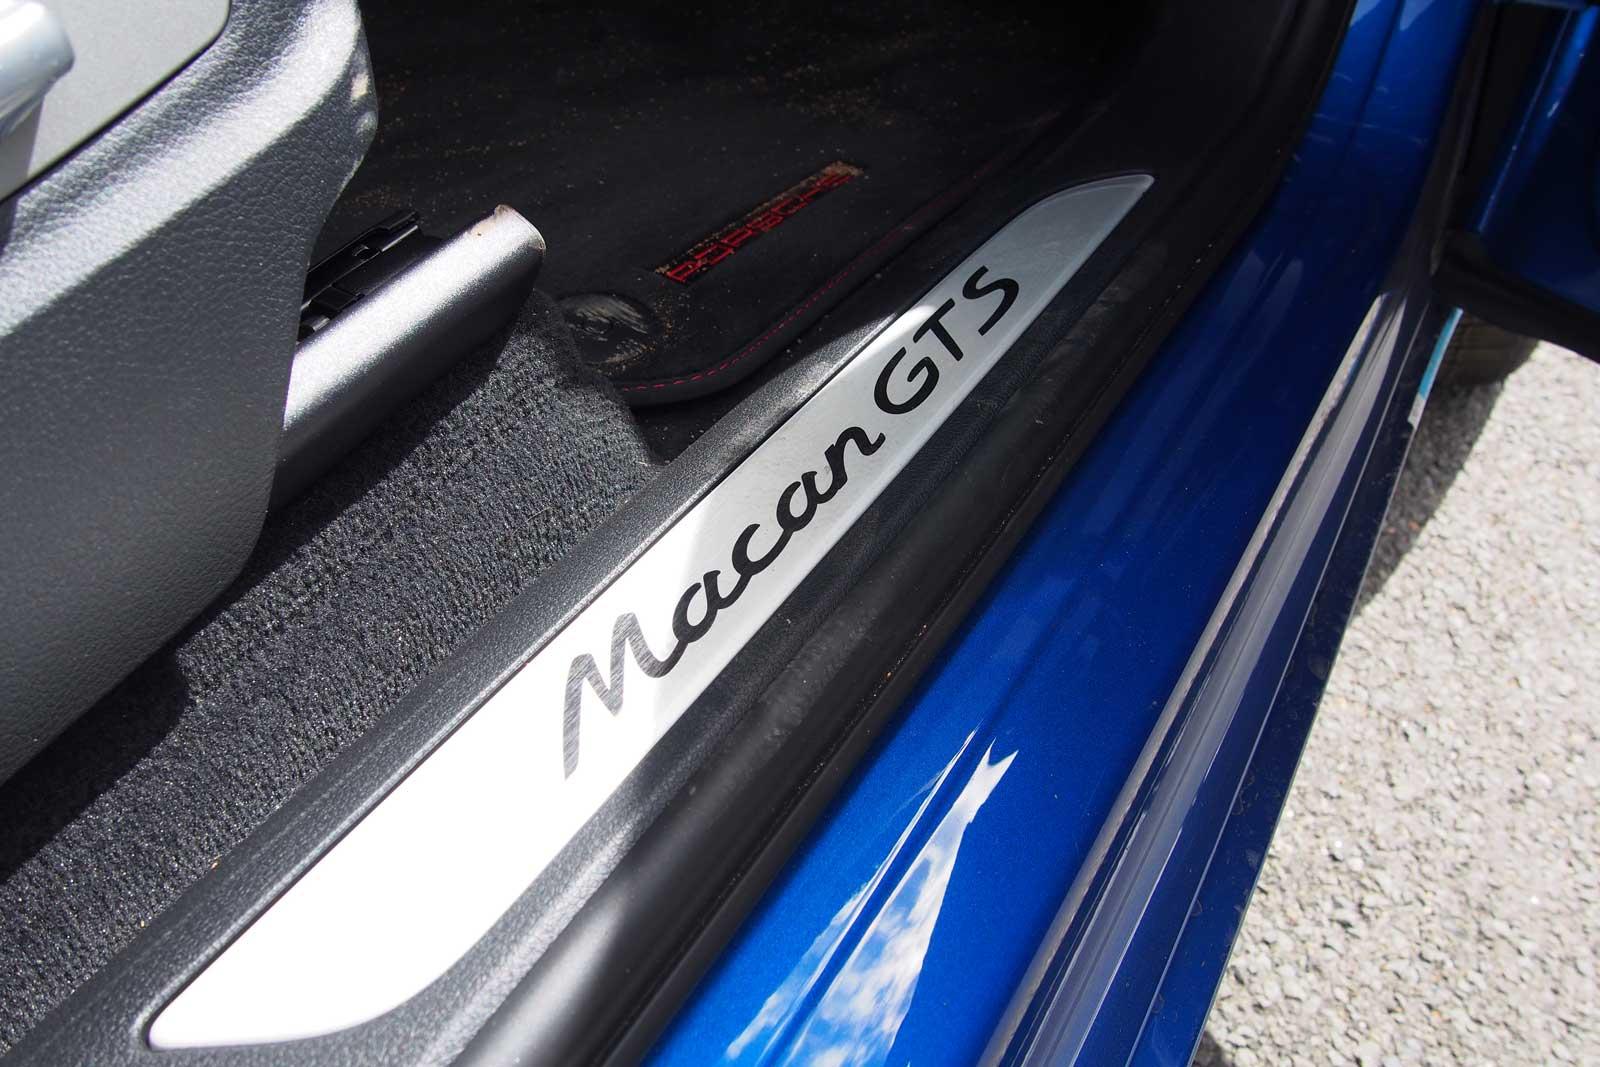 2017-Porsche-Macan-Door-Sill-01